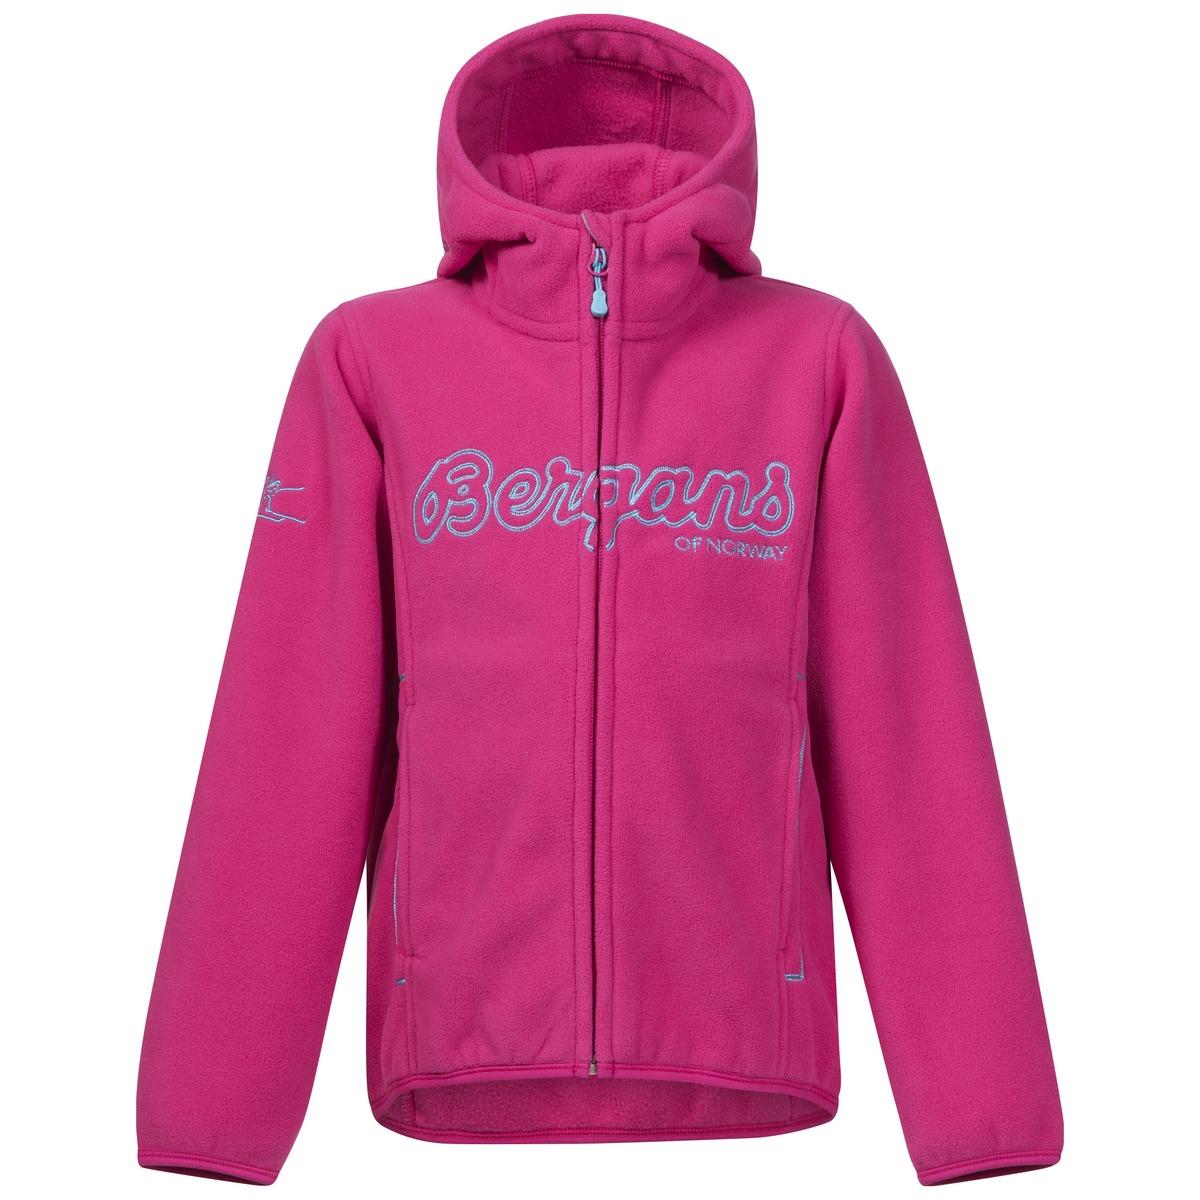 1b012789044 Find fiolett bergans bryggen jacket fleecejakke junior fleecetrøyer ...